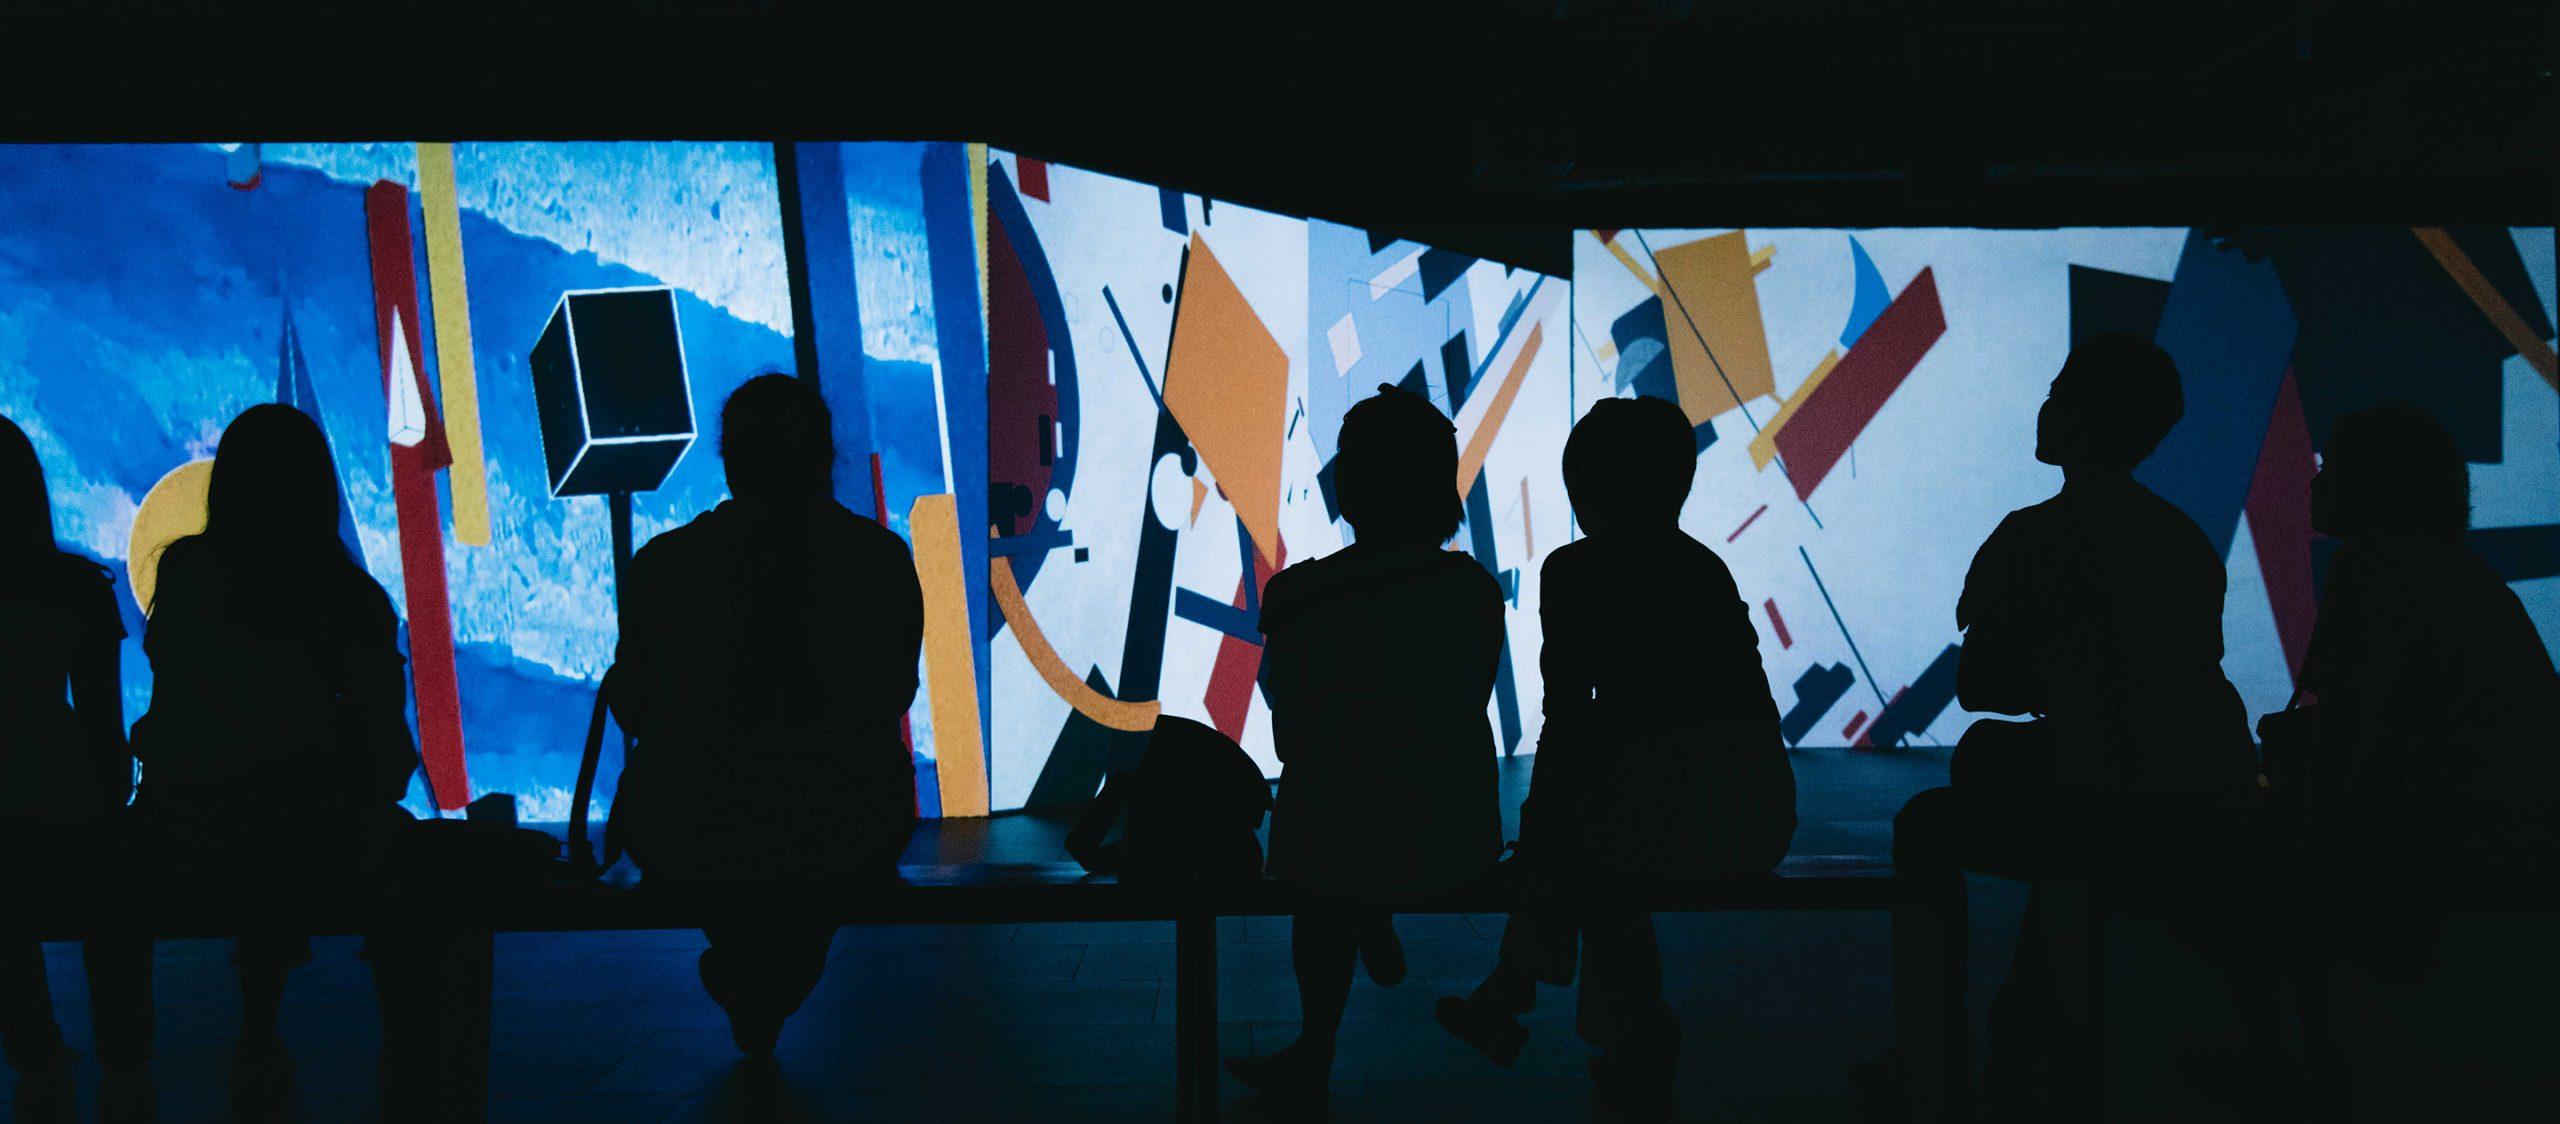 a day experience : From Monet to Kandinsky เบื้องหลังงานศิลปะระดับโลก และวาดรูปบนรูฟท็อปกับโอ๊ต–มณเฑียร